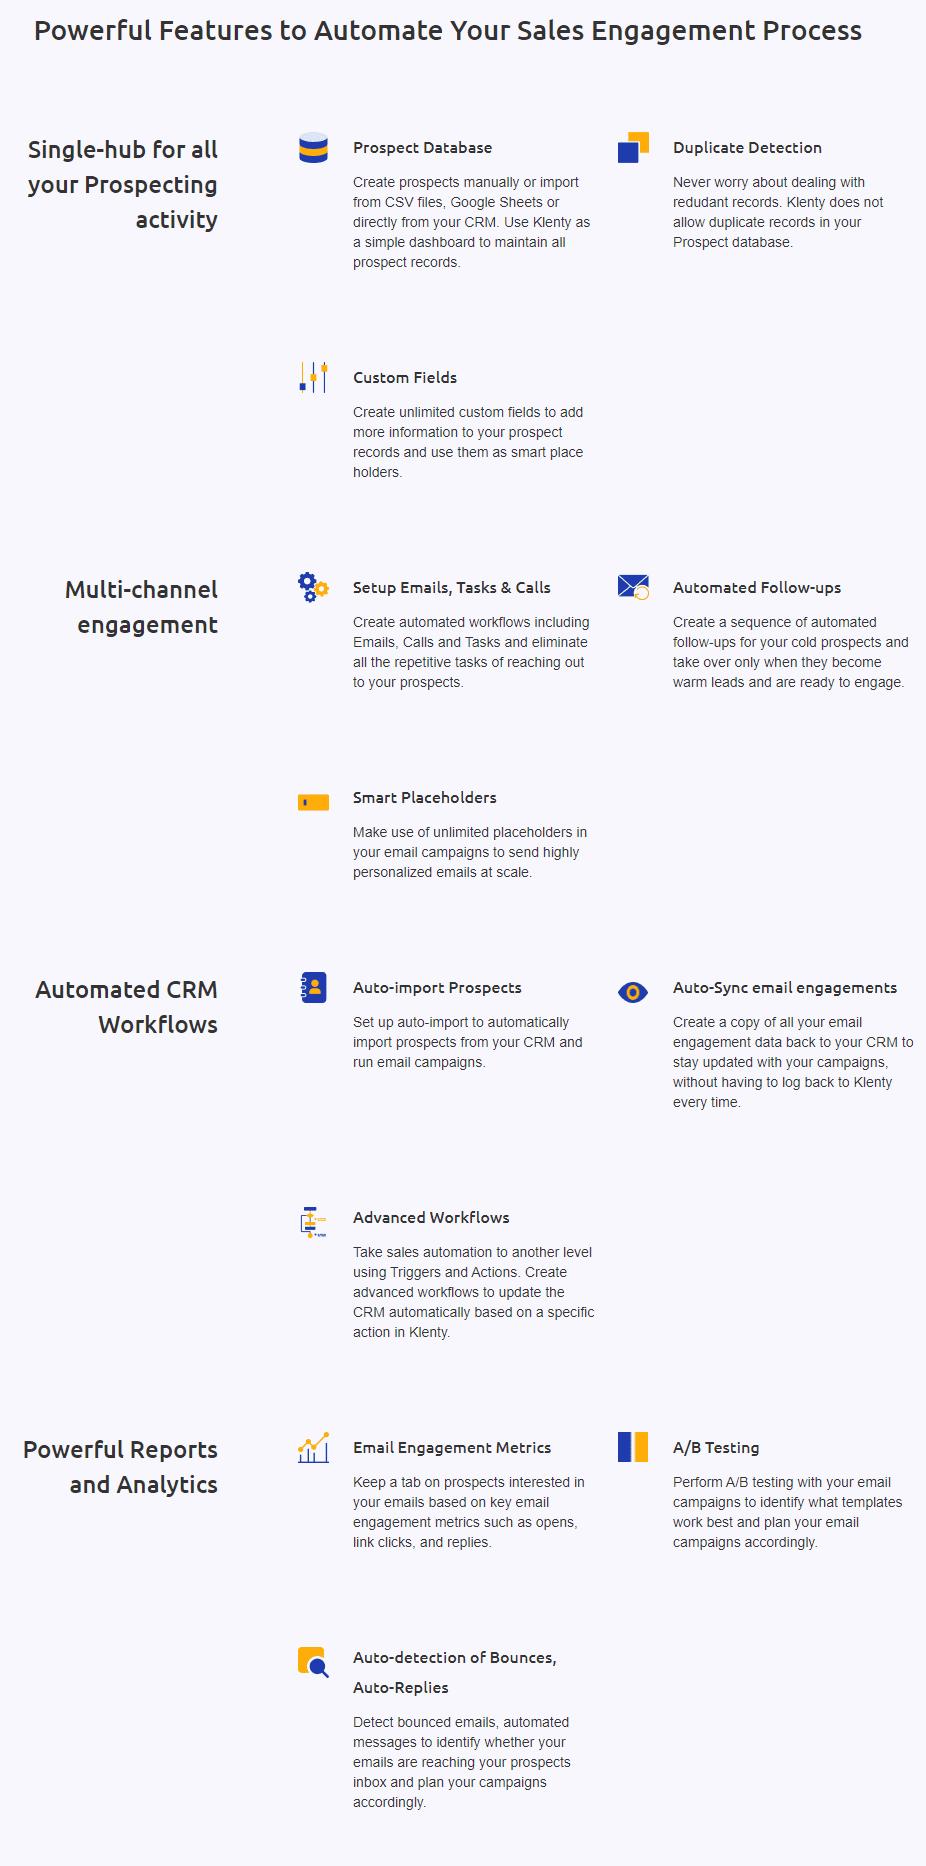 Sales Engagement Platform